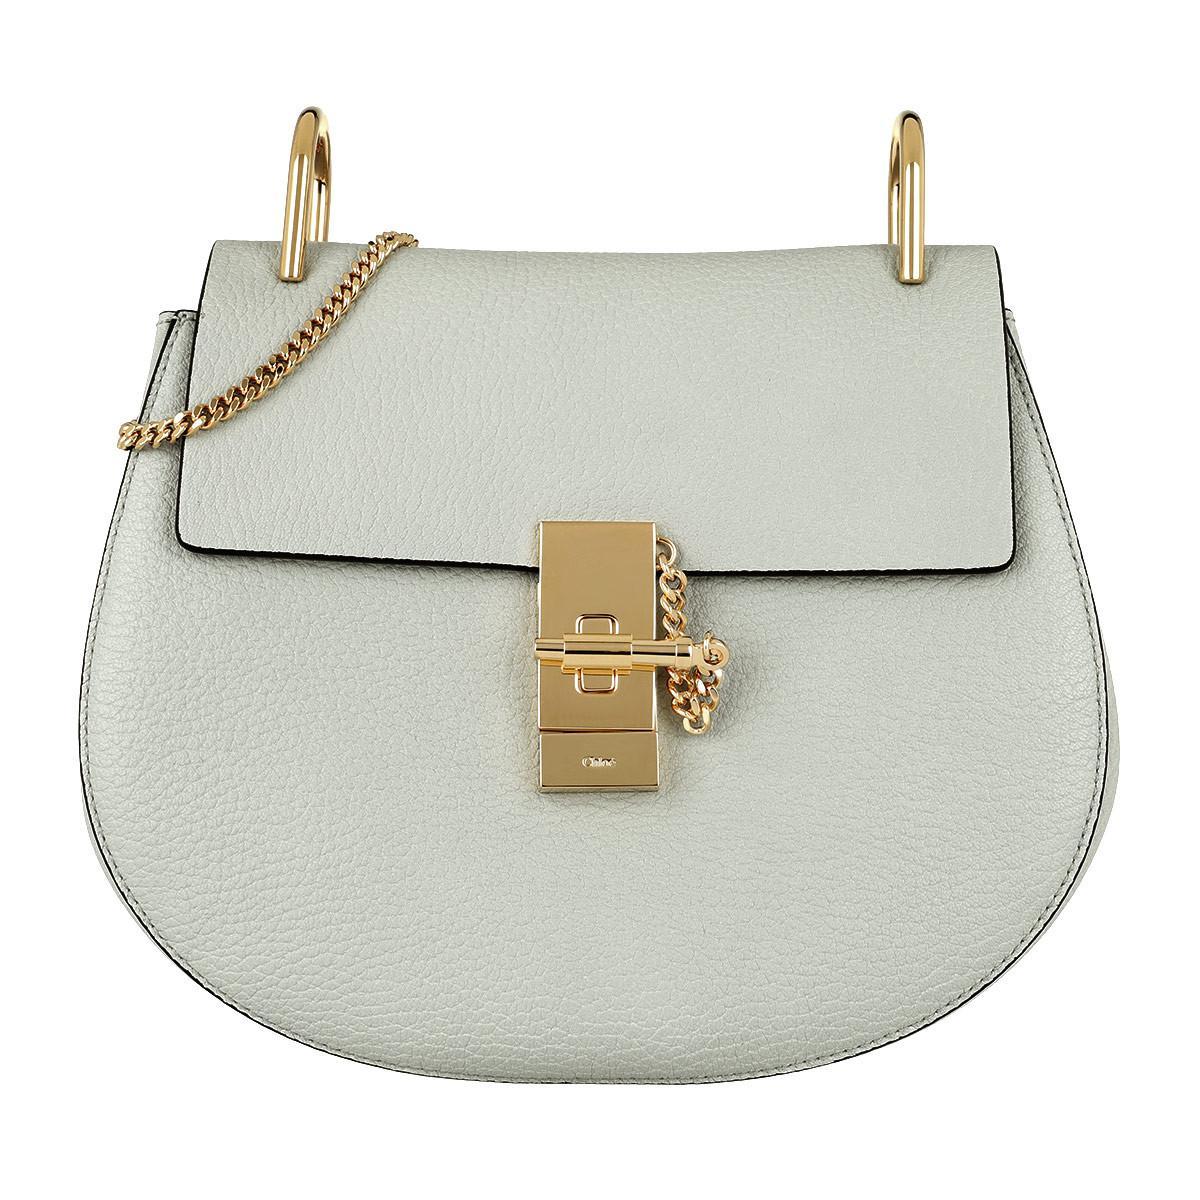 a4c33339 Chloé Drew Shoulder Bag Small Grain Lambskin Airy Grey in Gray - Lyst